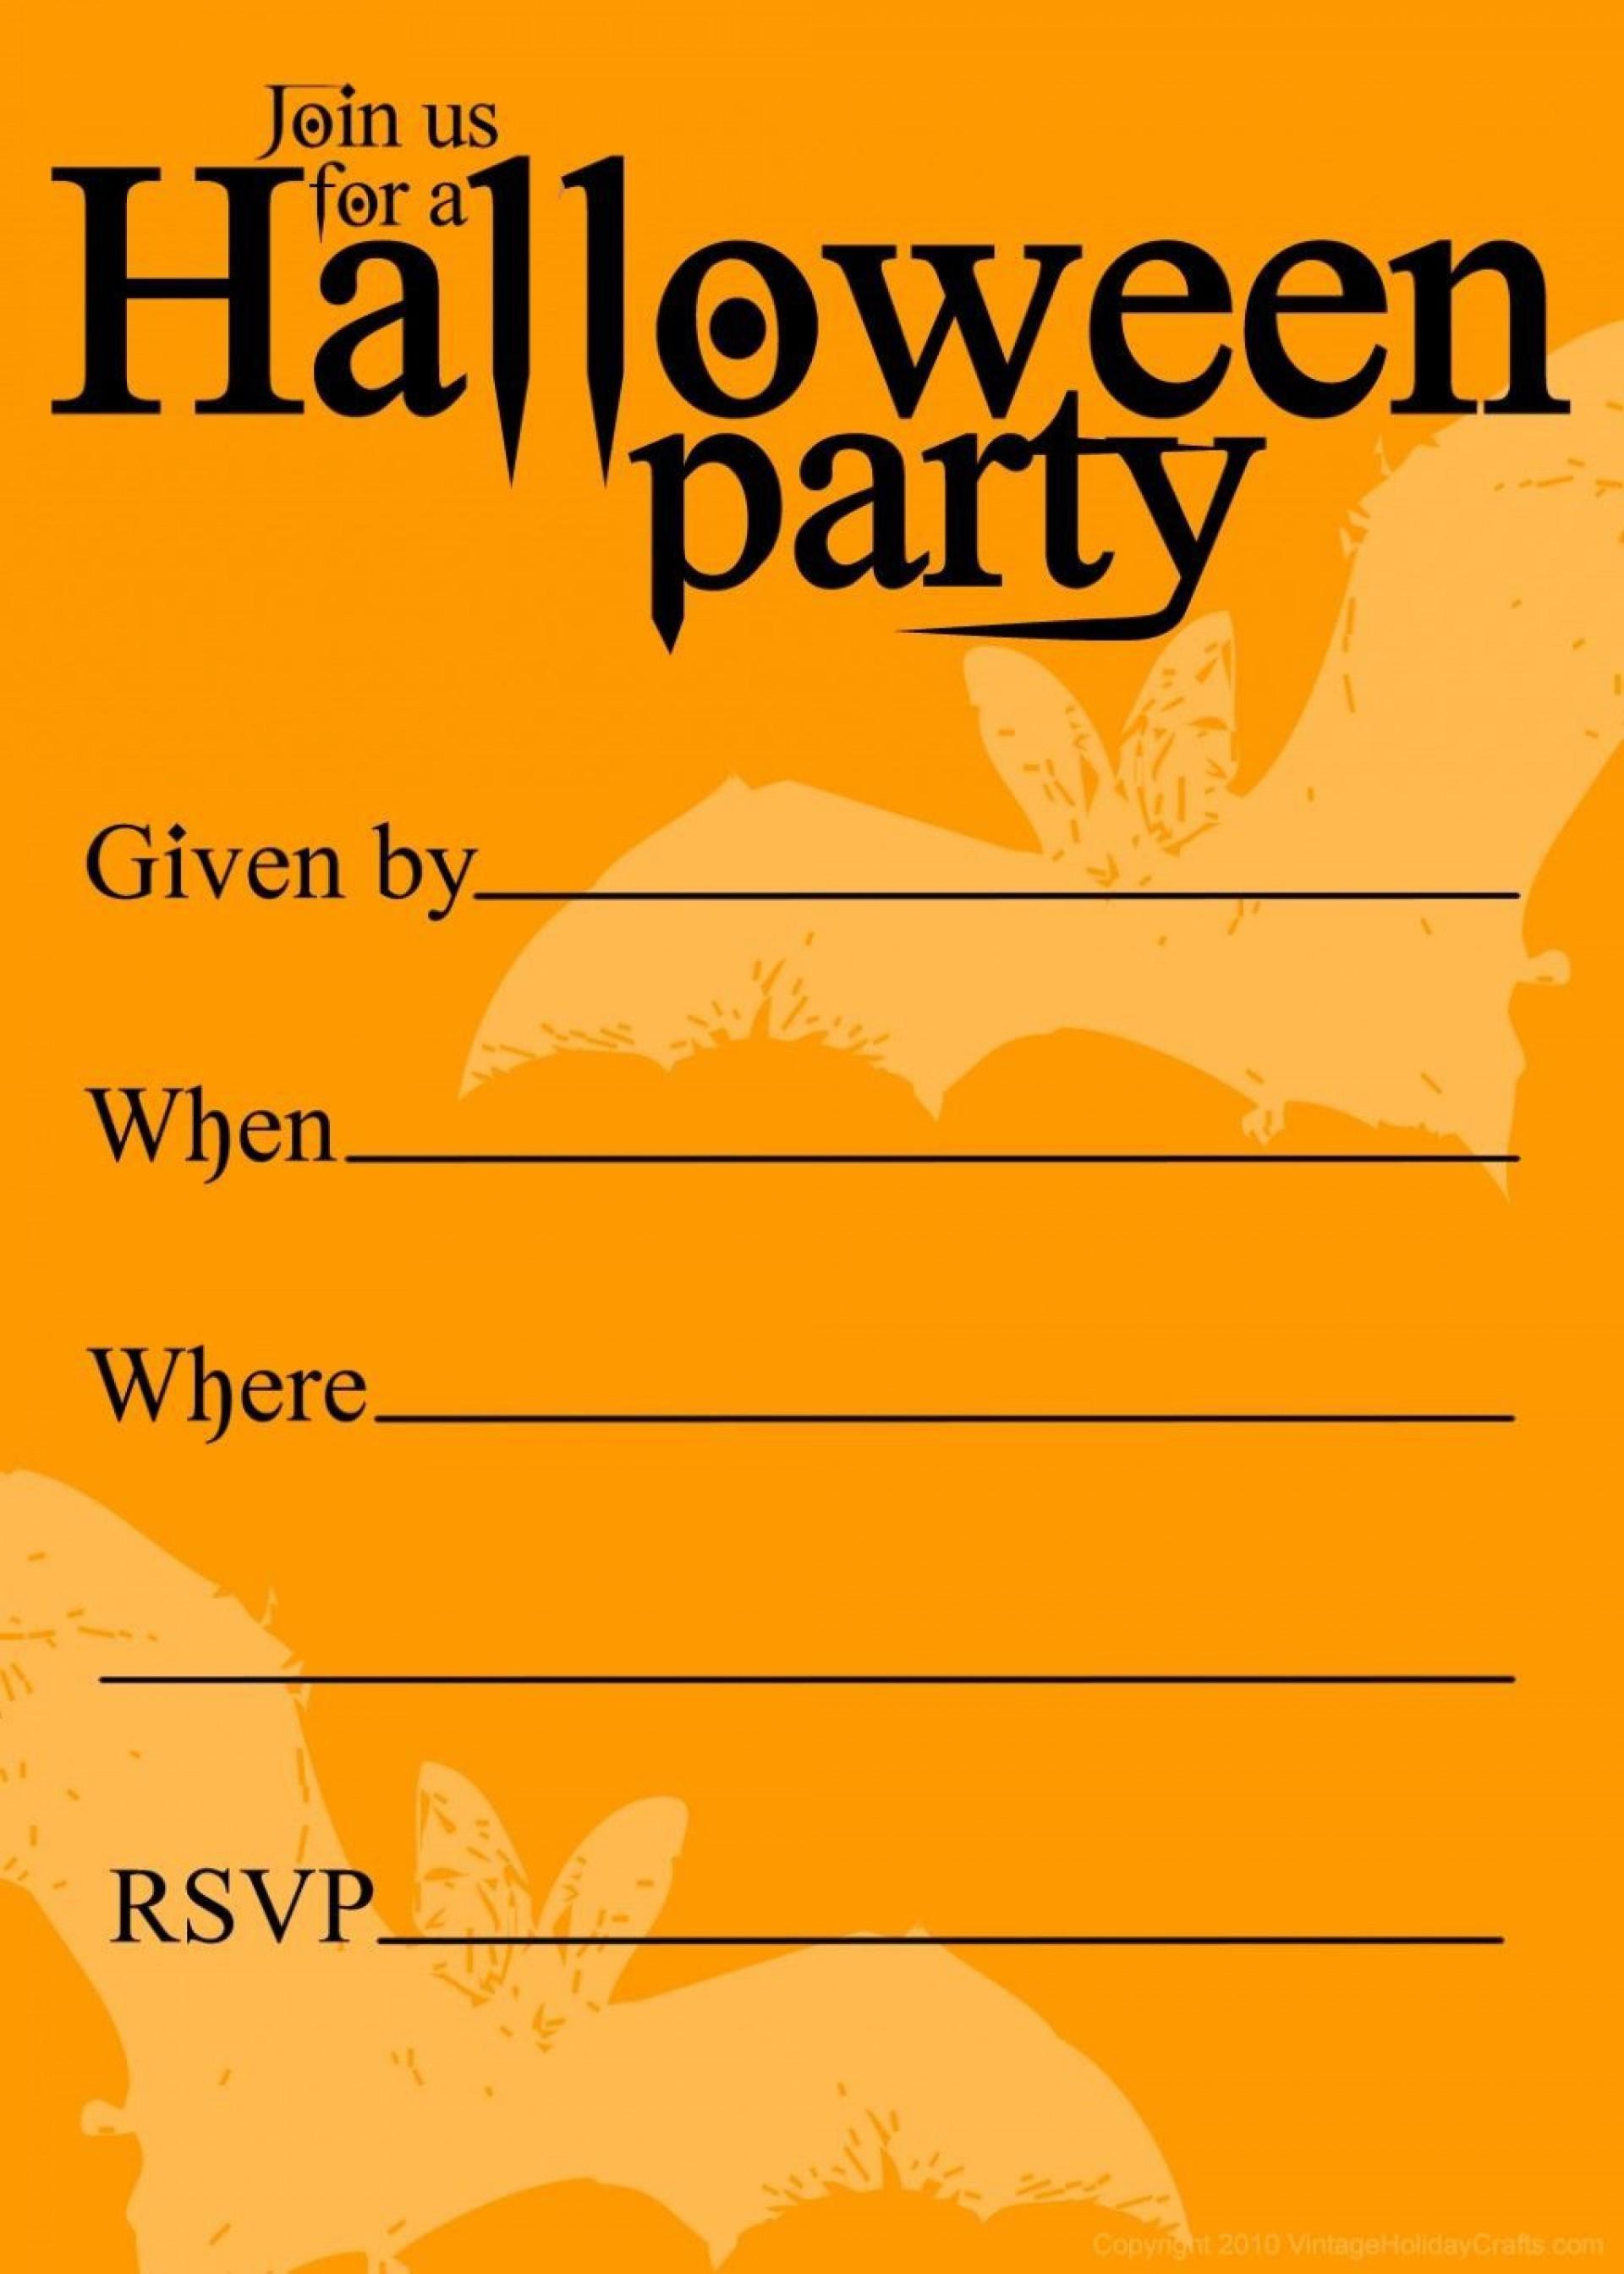 002 Fantastic Halloween Party Invite Template Concept  Templates - Free Printable Spooky Invitation Birthday1920